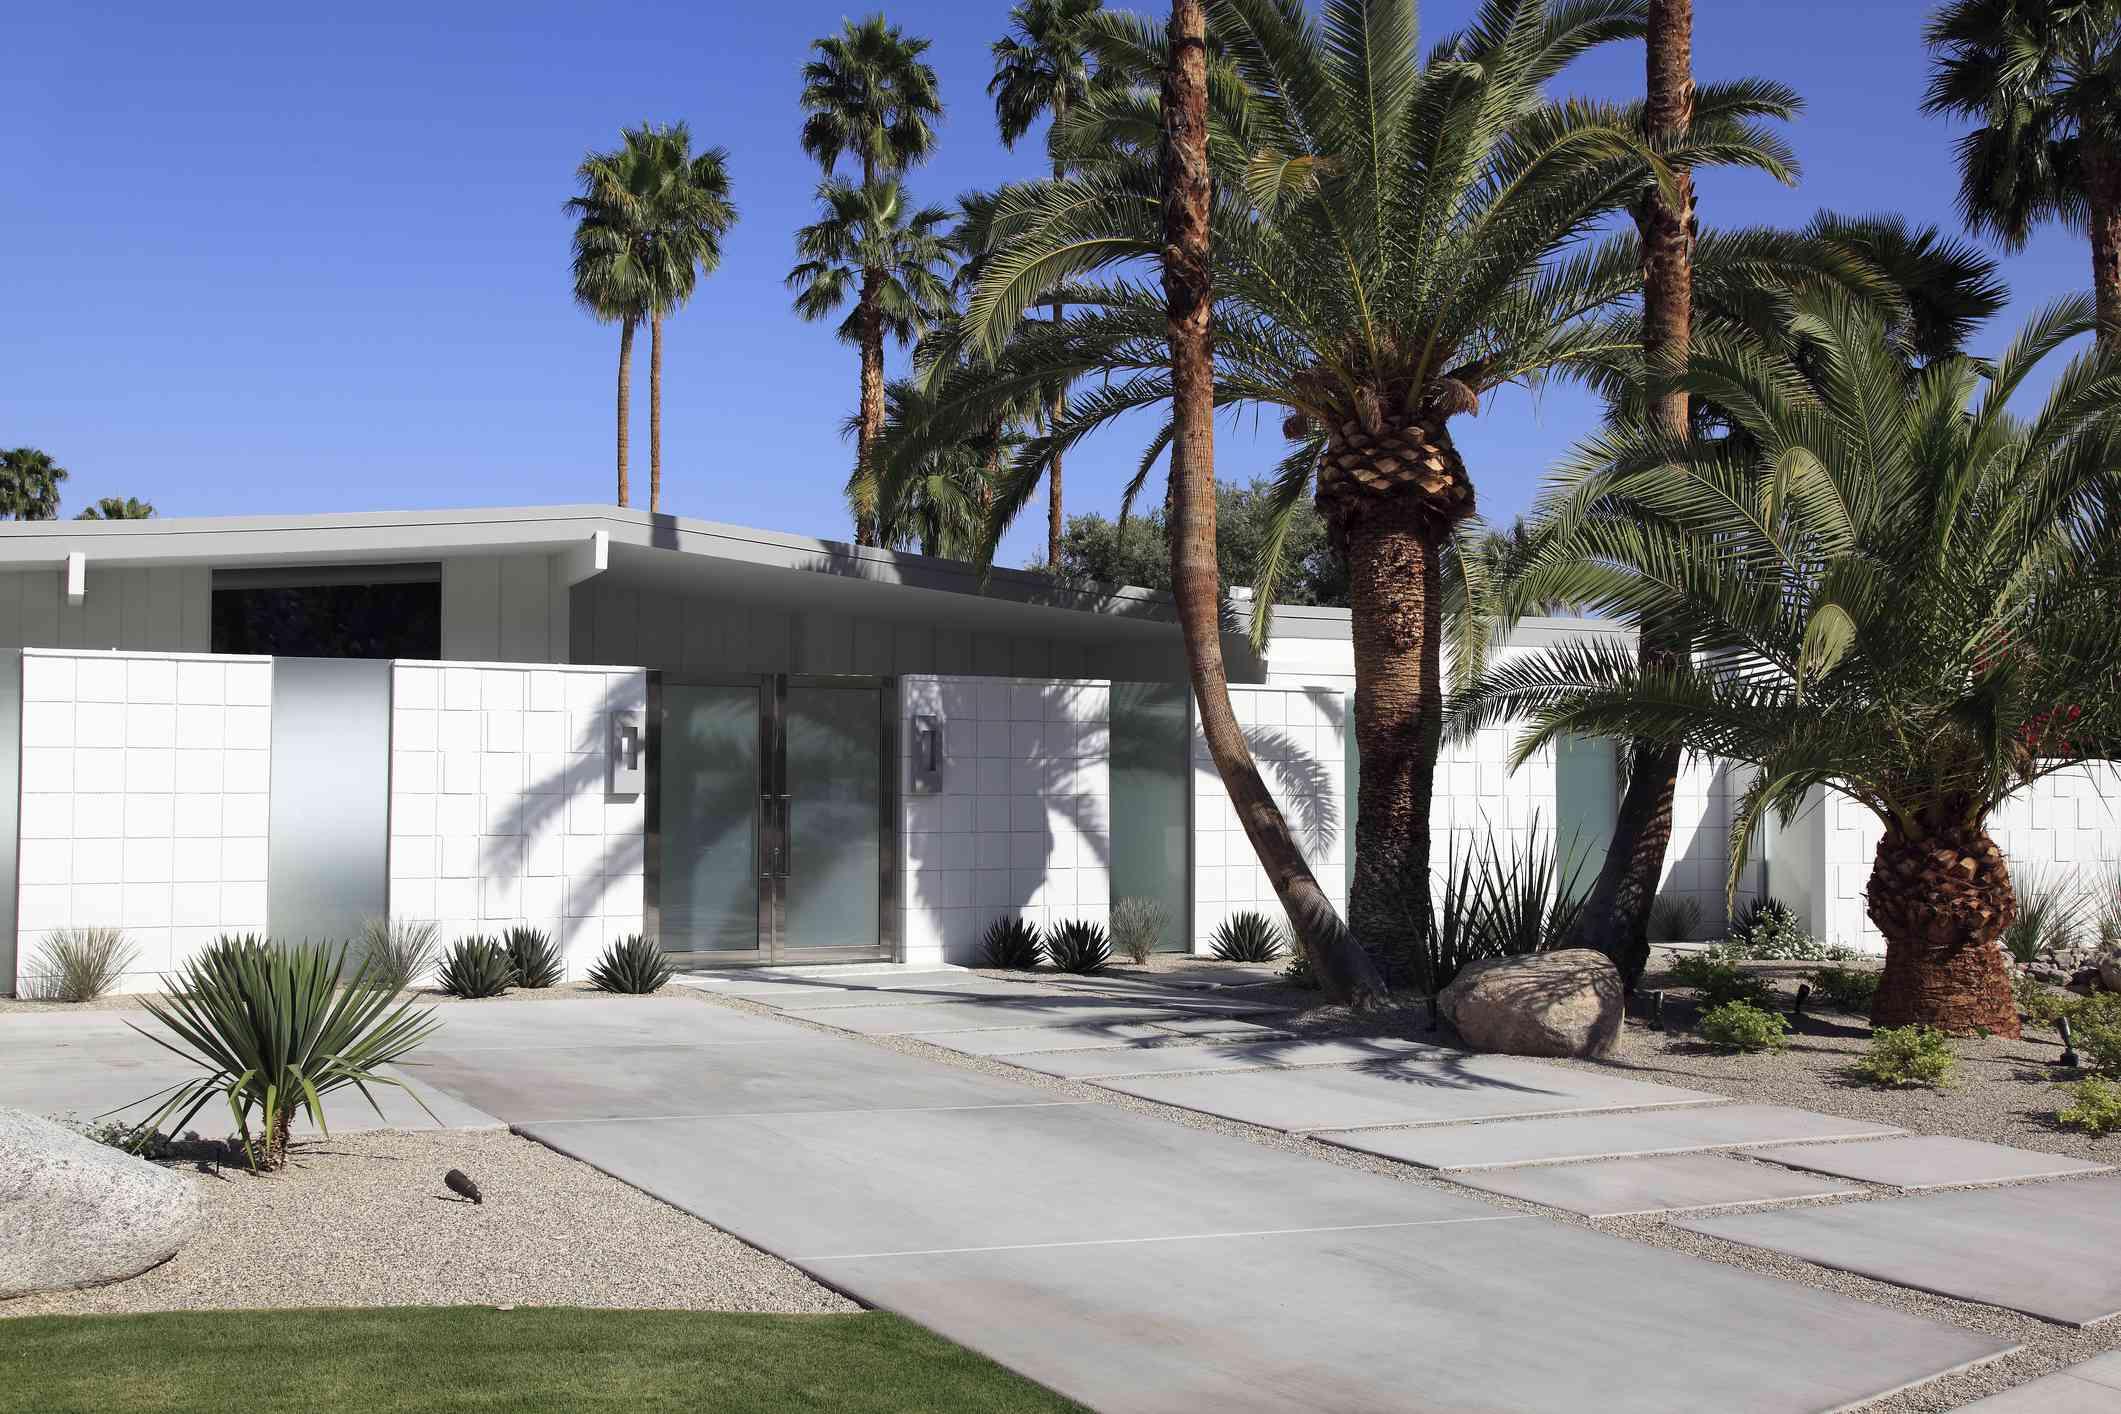 midcentury modern style home